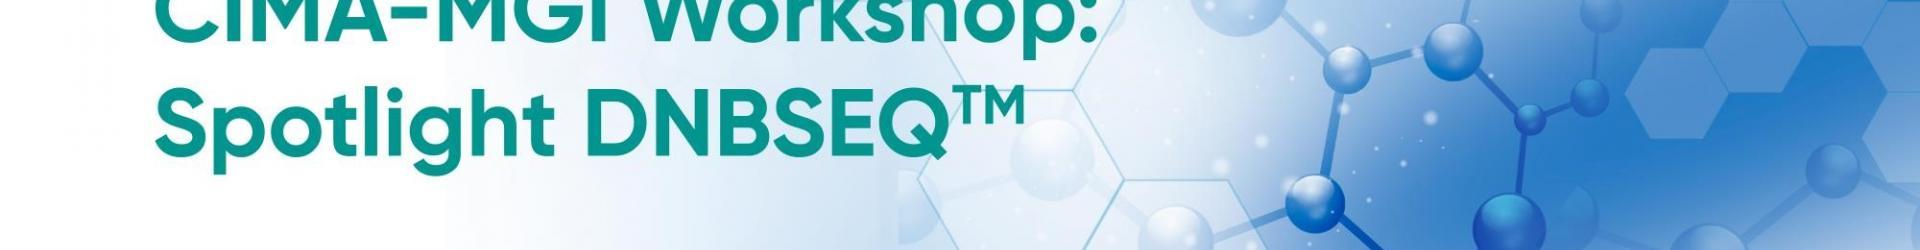 CIMA-MGI WokShop: Spotlight DNBSEQ